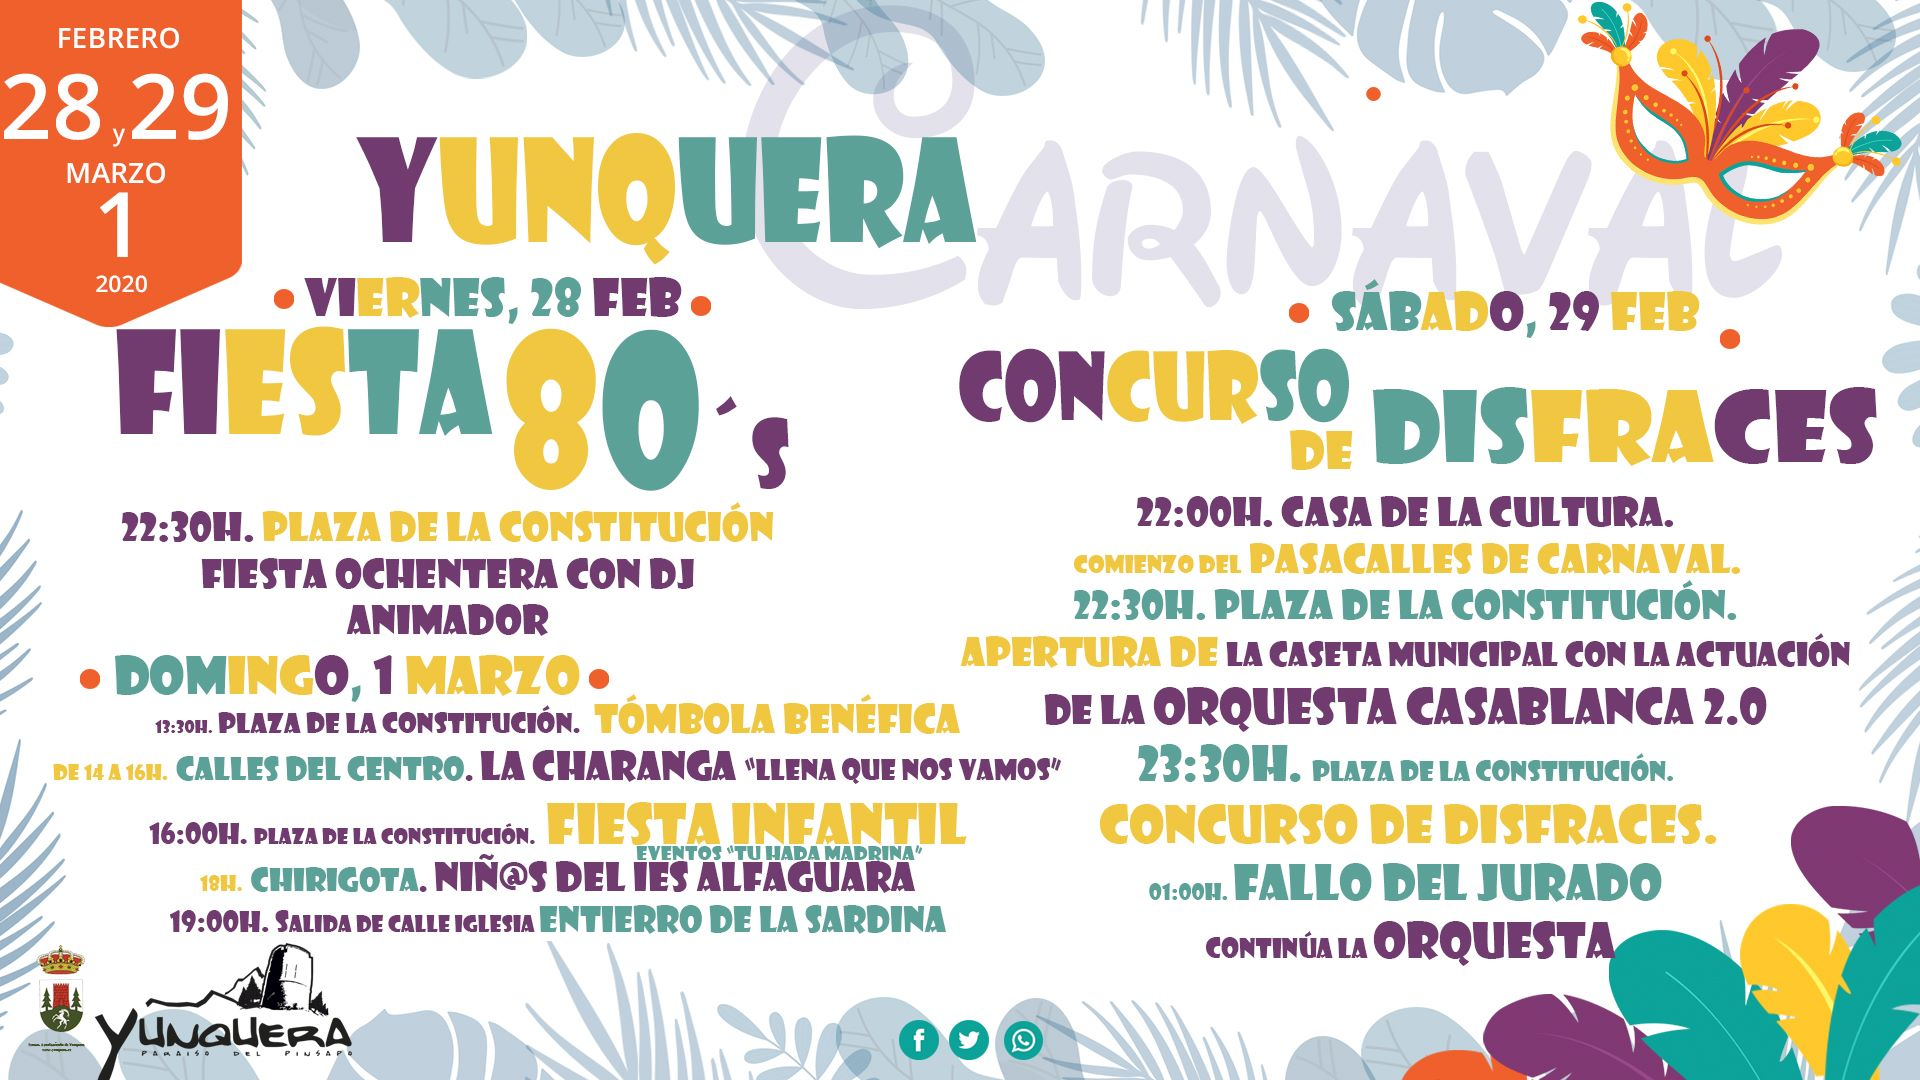 Carnaval 2020 - Yunquera (Málaga)